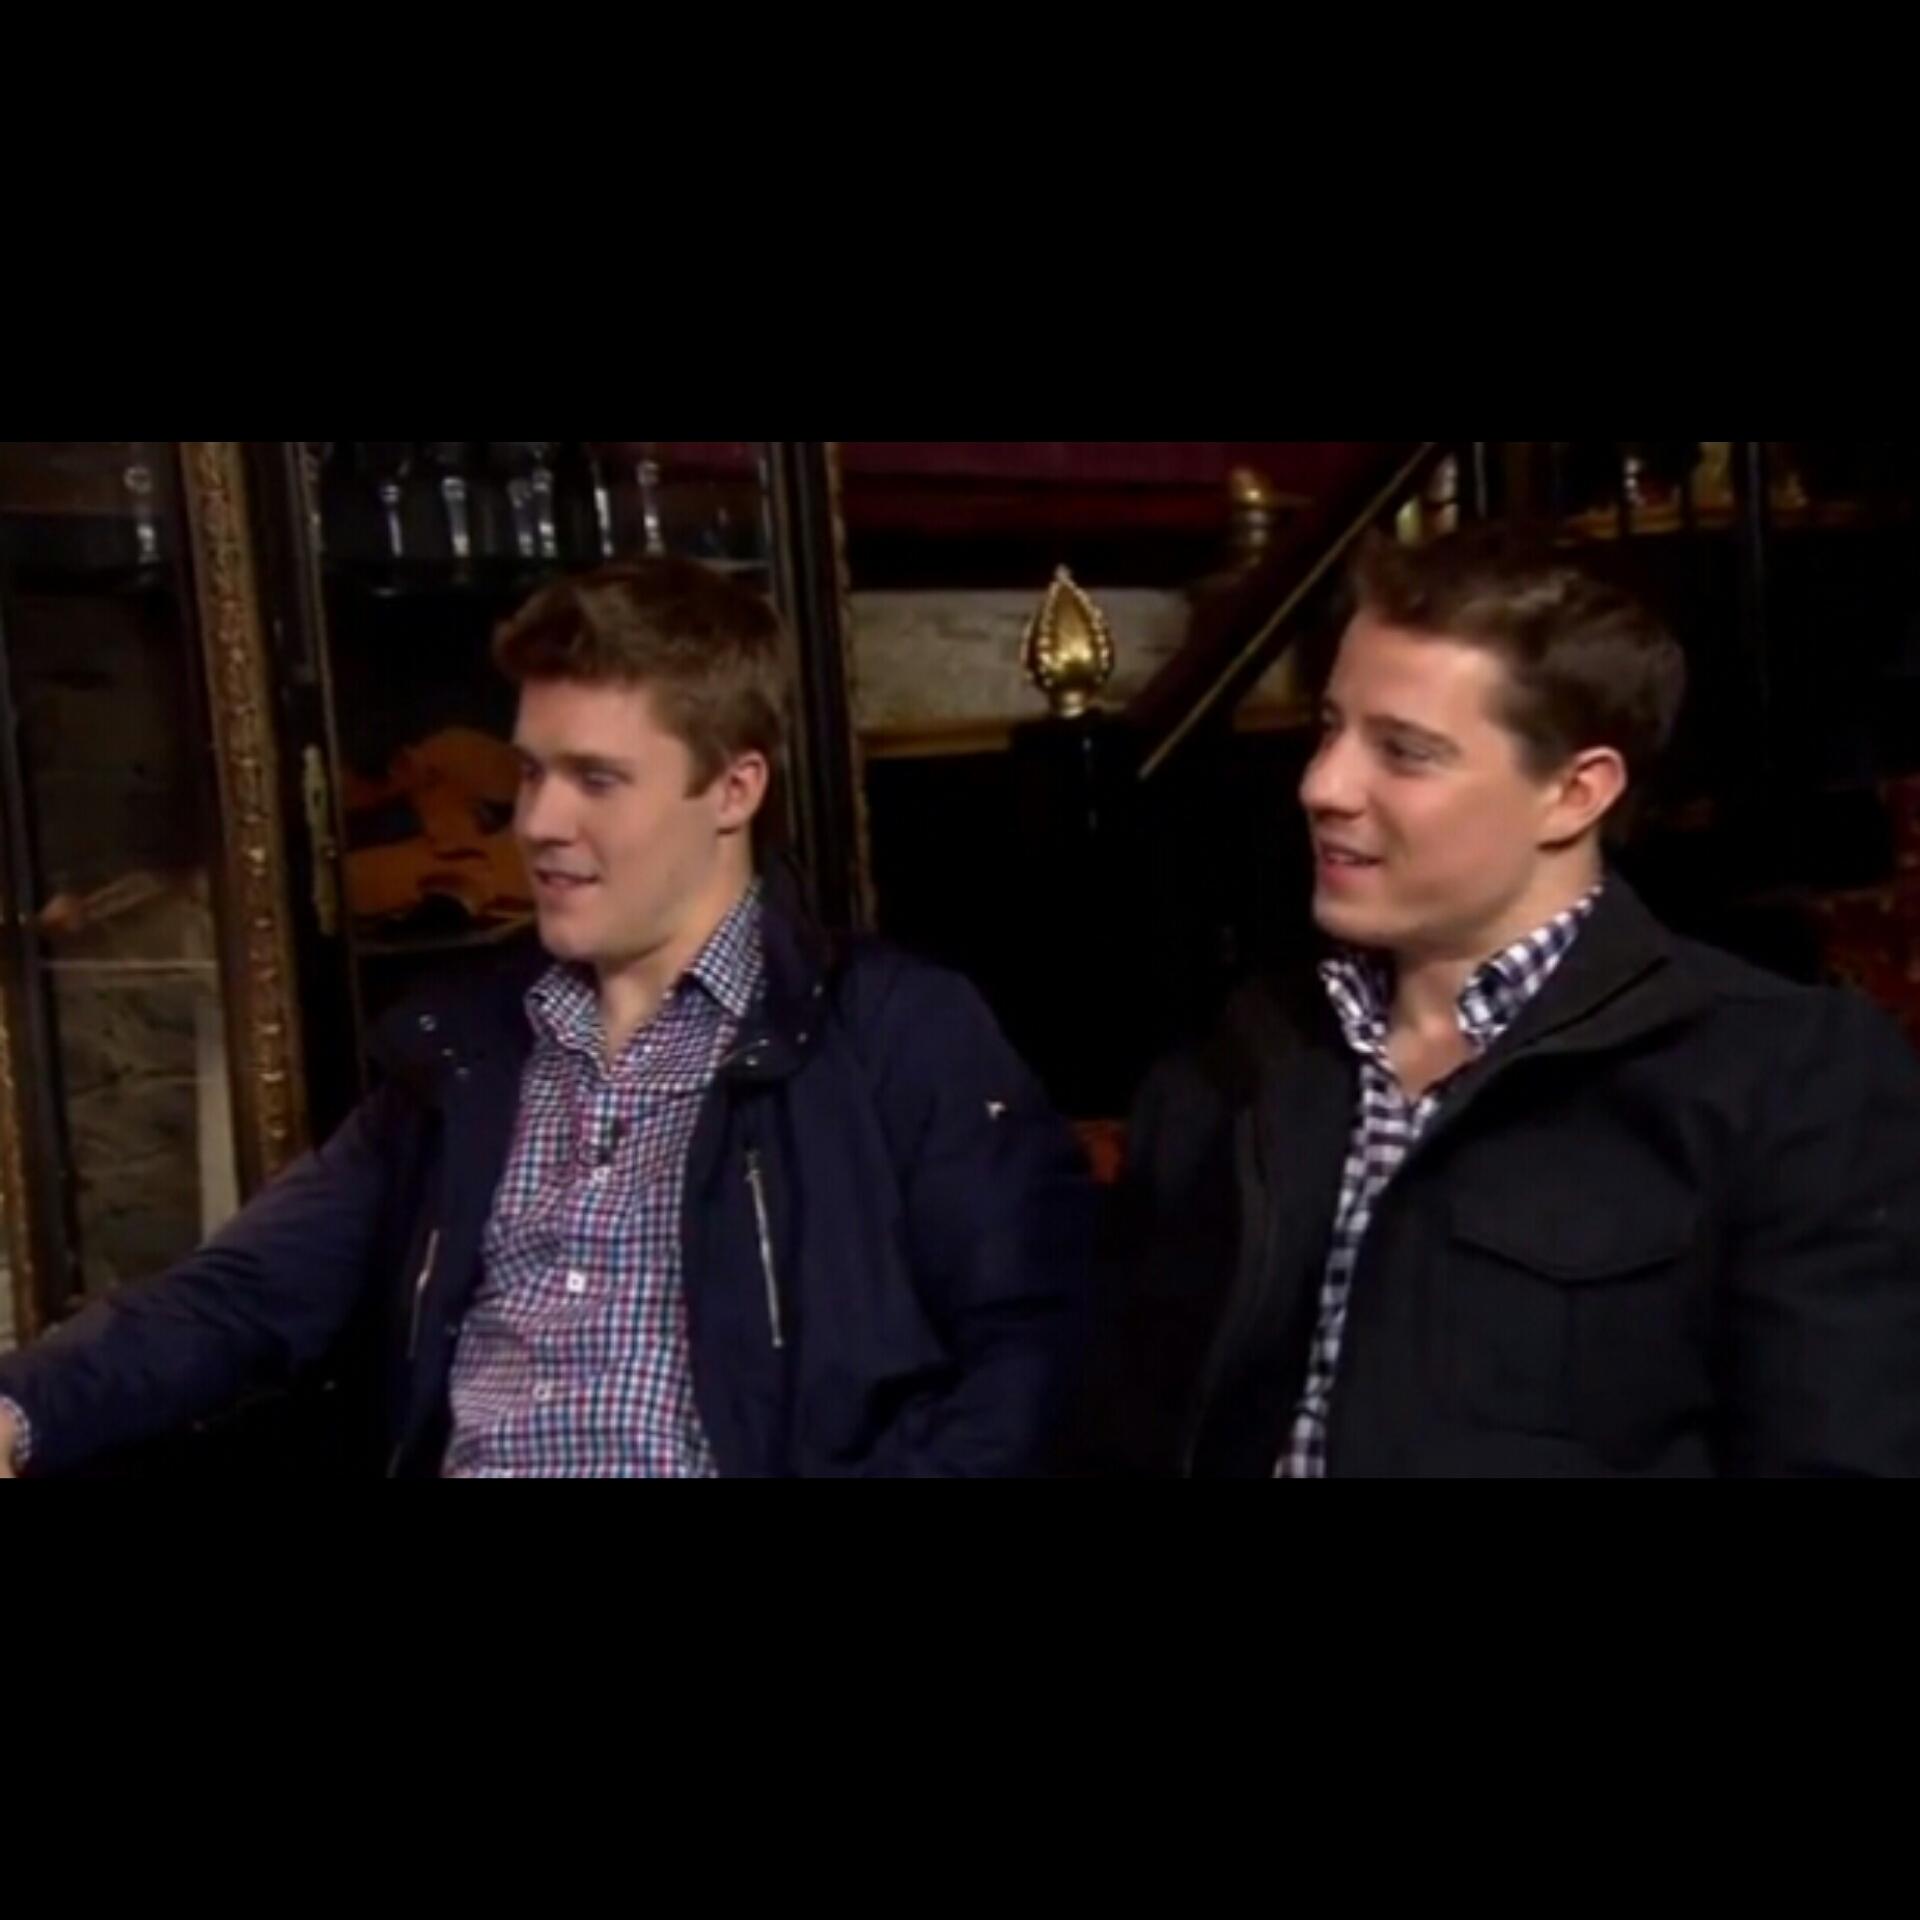 Toronto Maple Leafs-Matt Frattin and Jake Gardiner